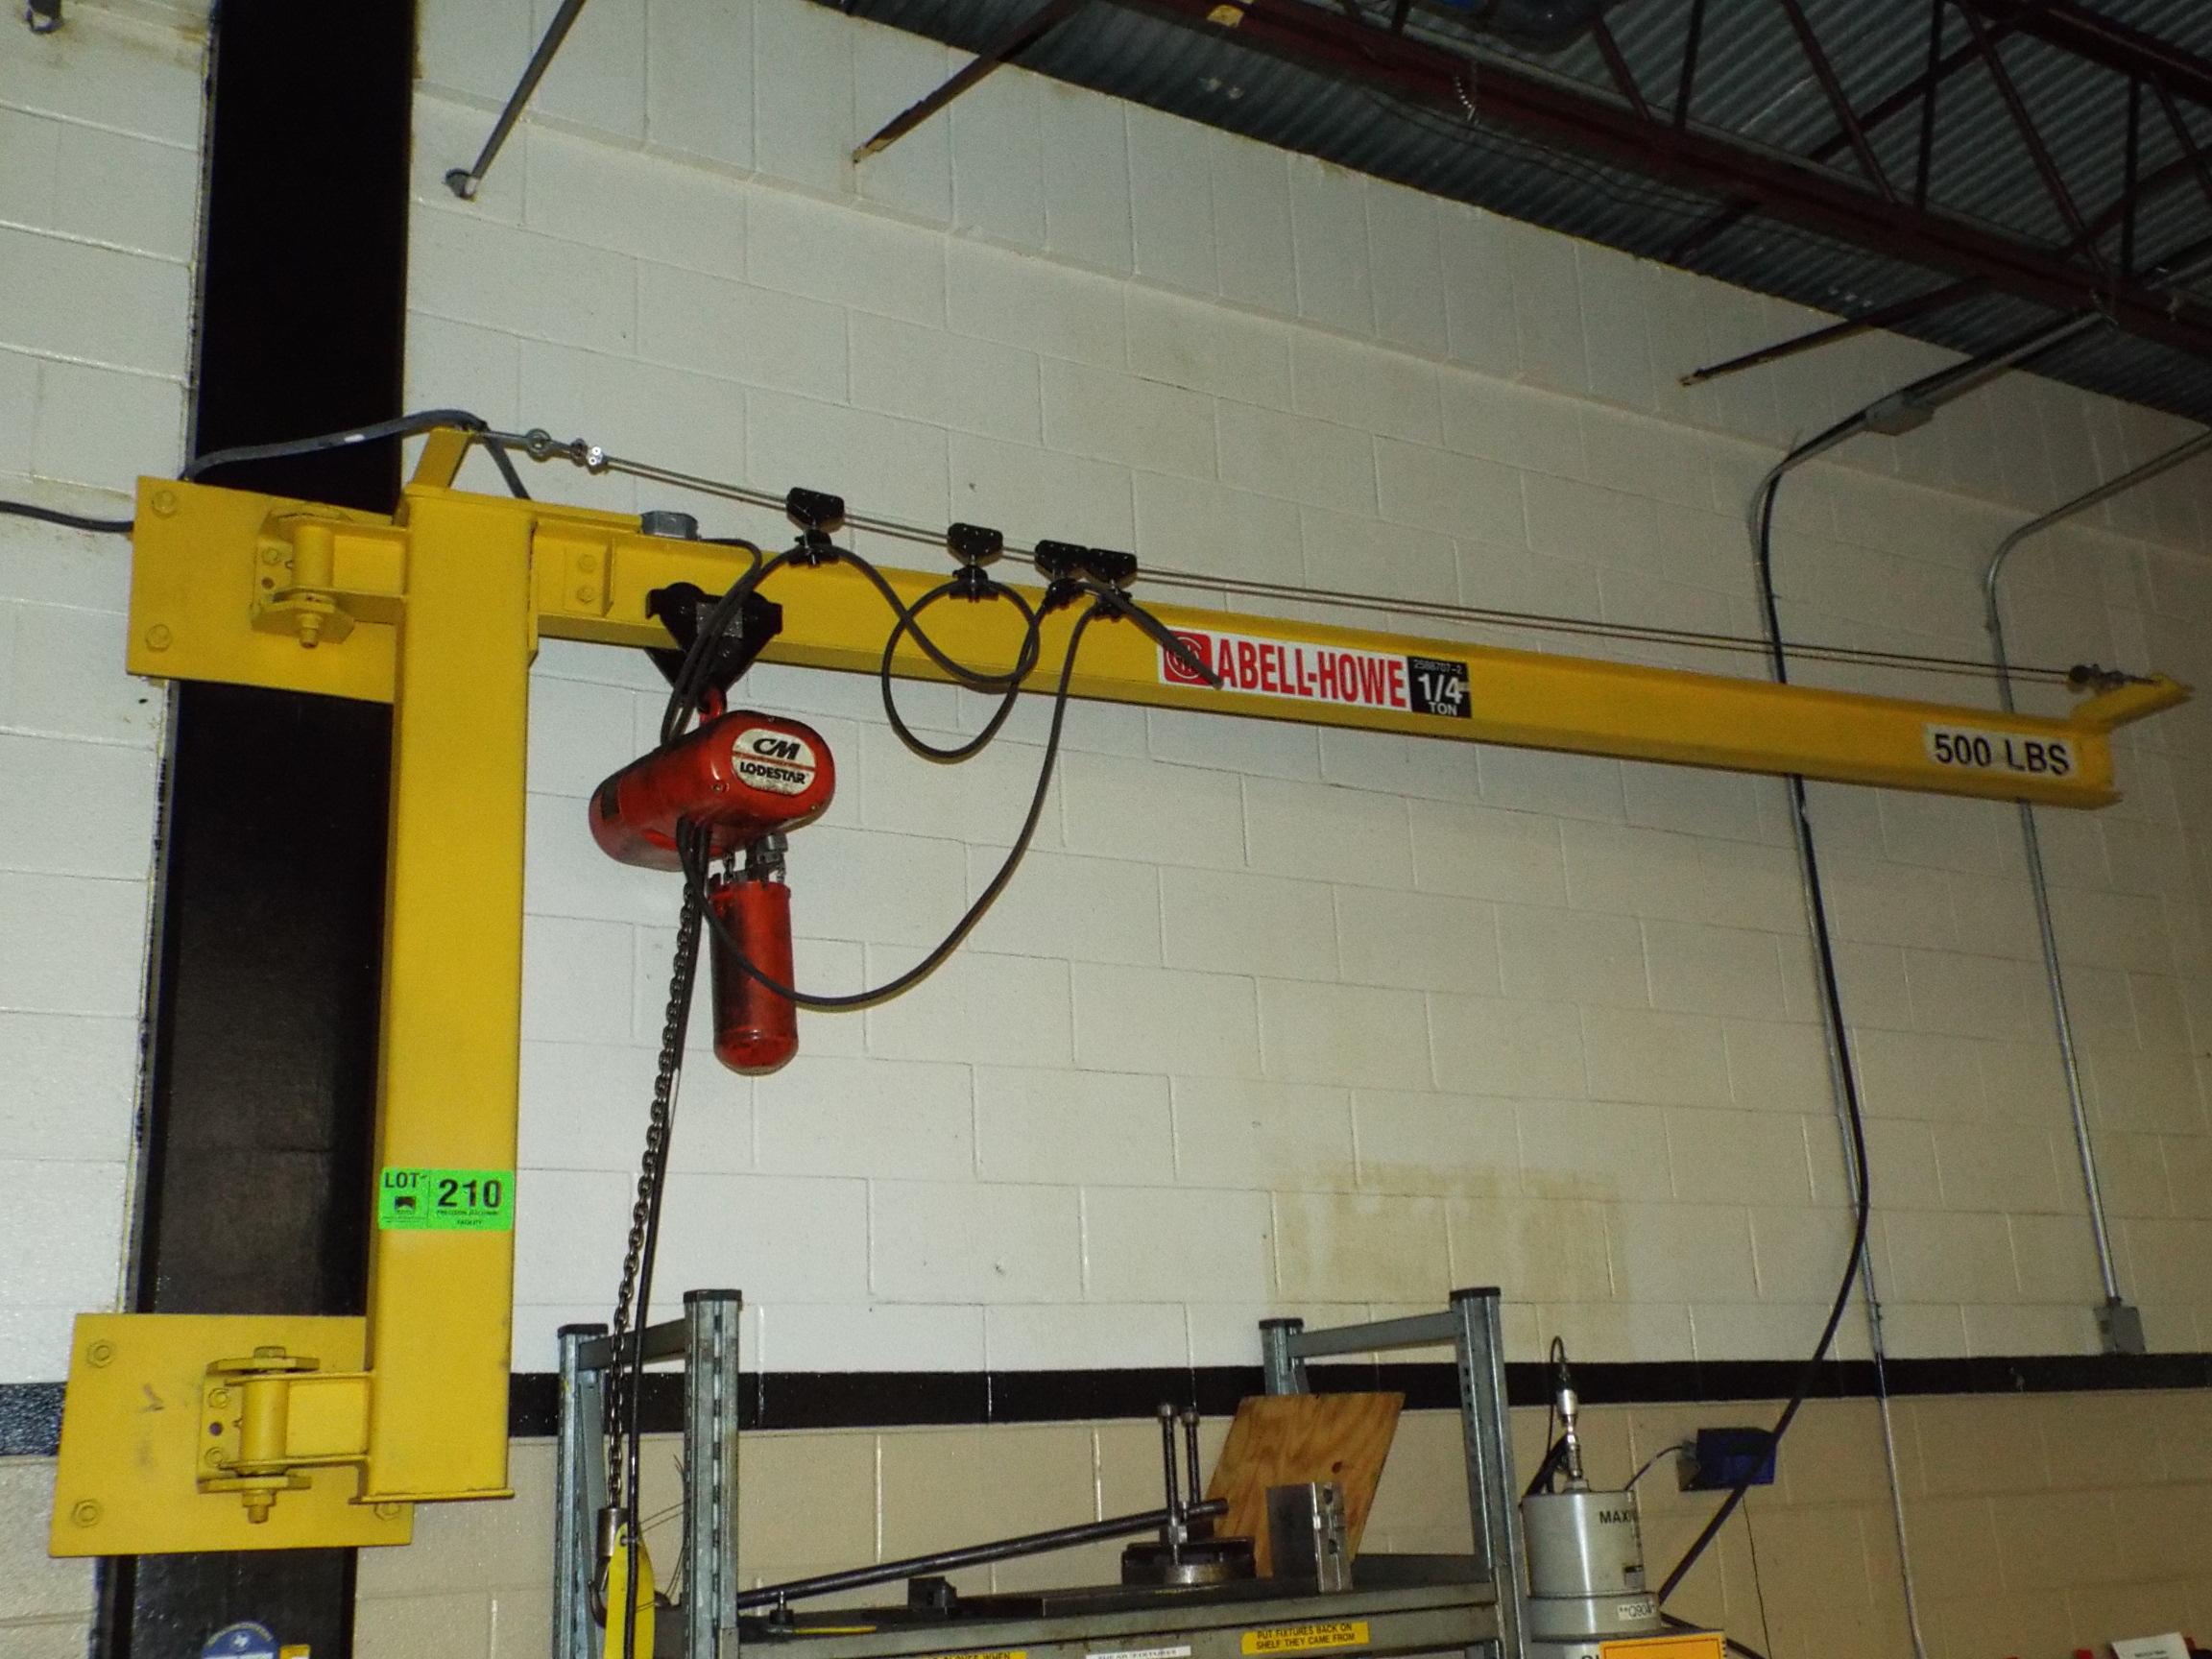 Motorized Wall Mounted Jib Crane : Abell howe ton capacity wall mounted jib arm with cm